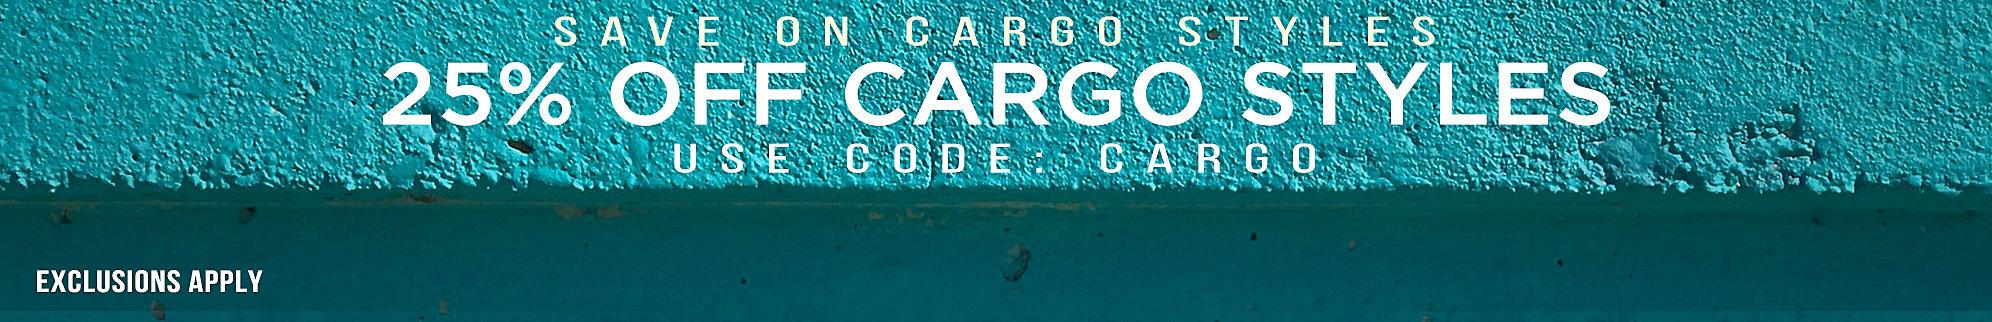 25% Off Cargo Styles